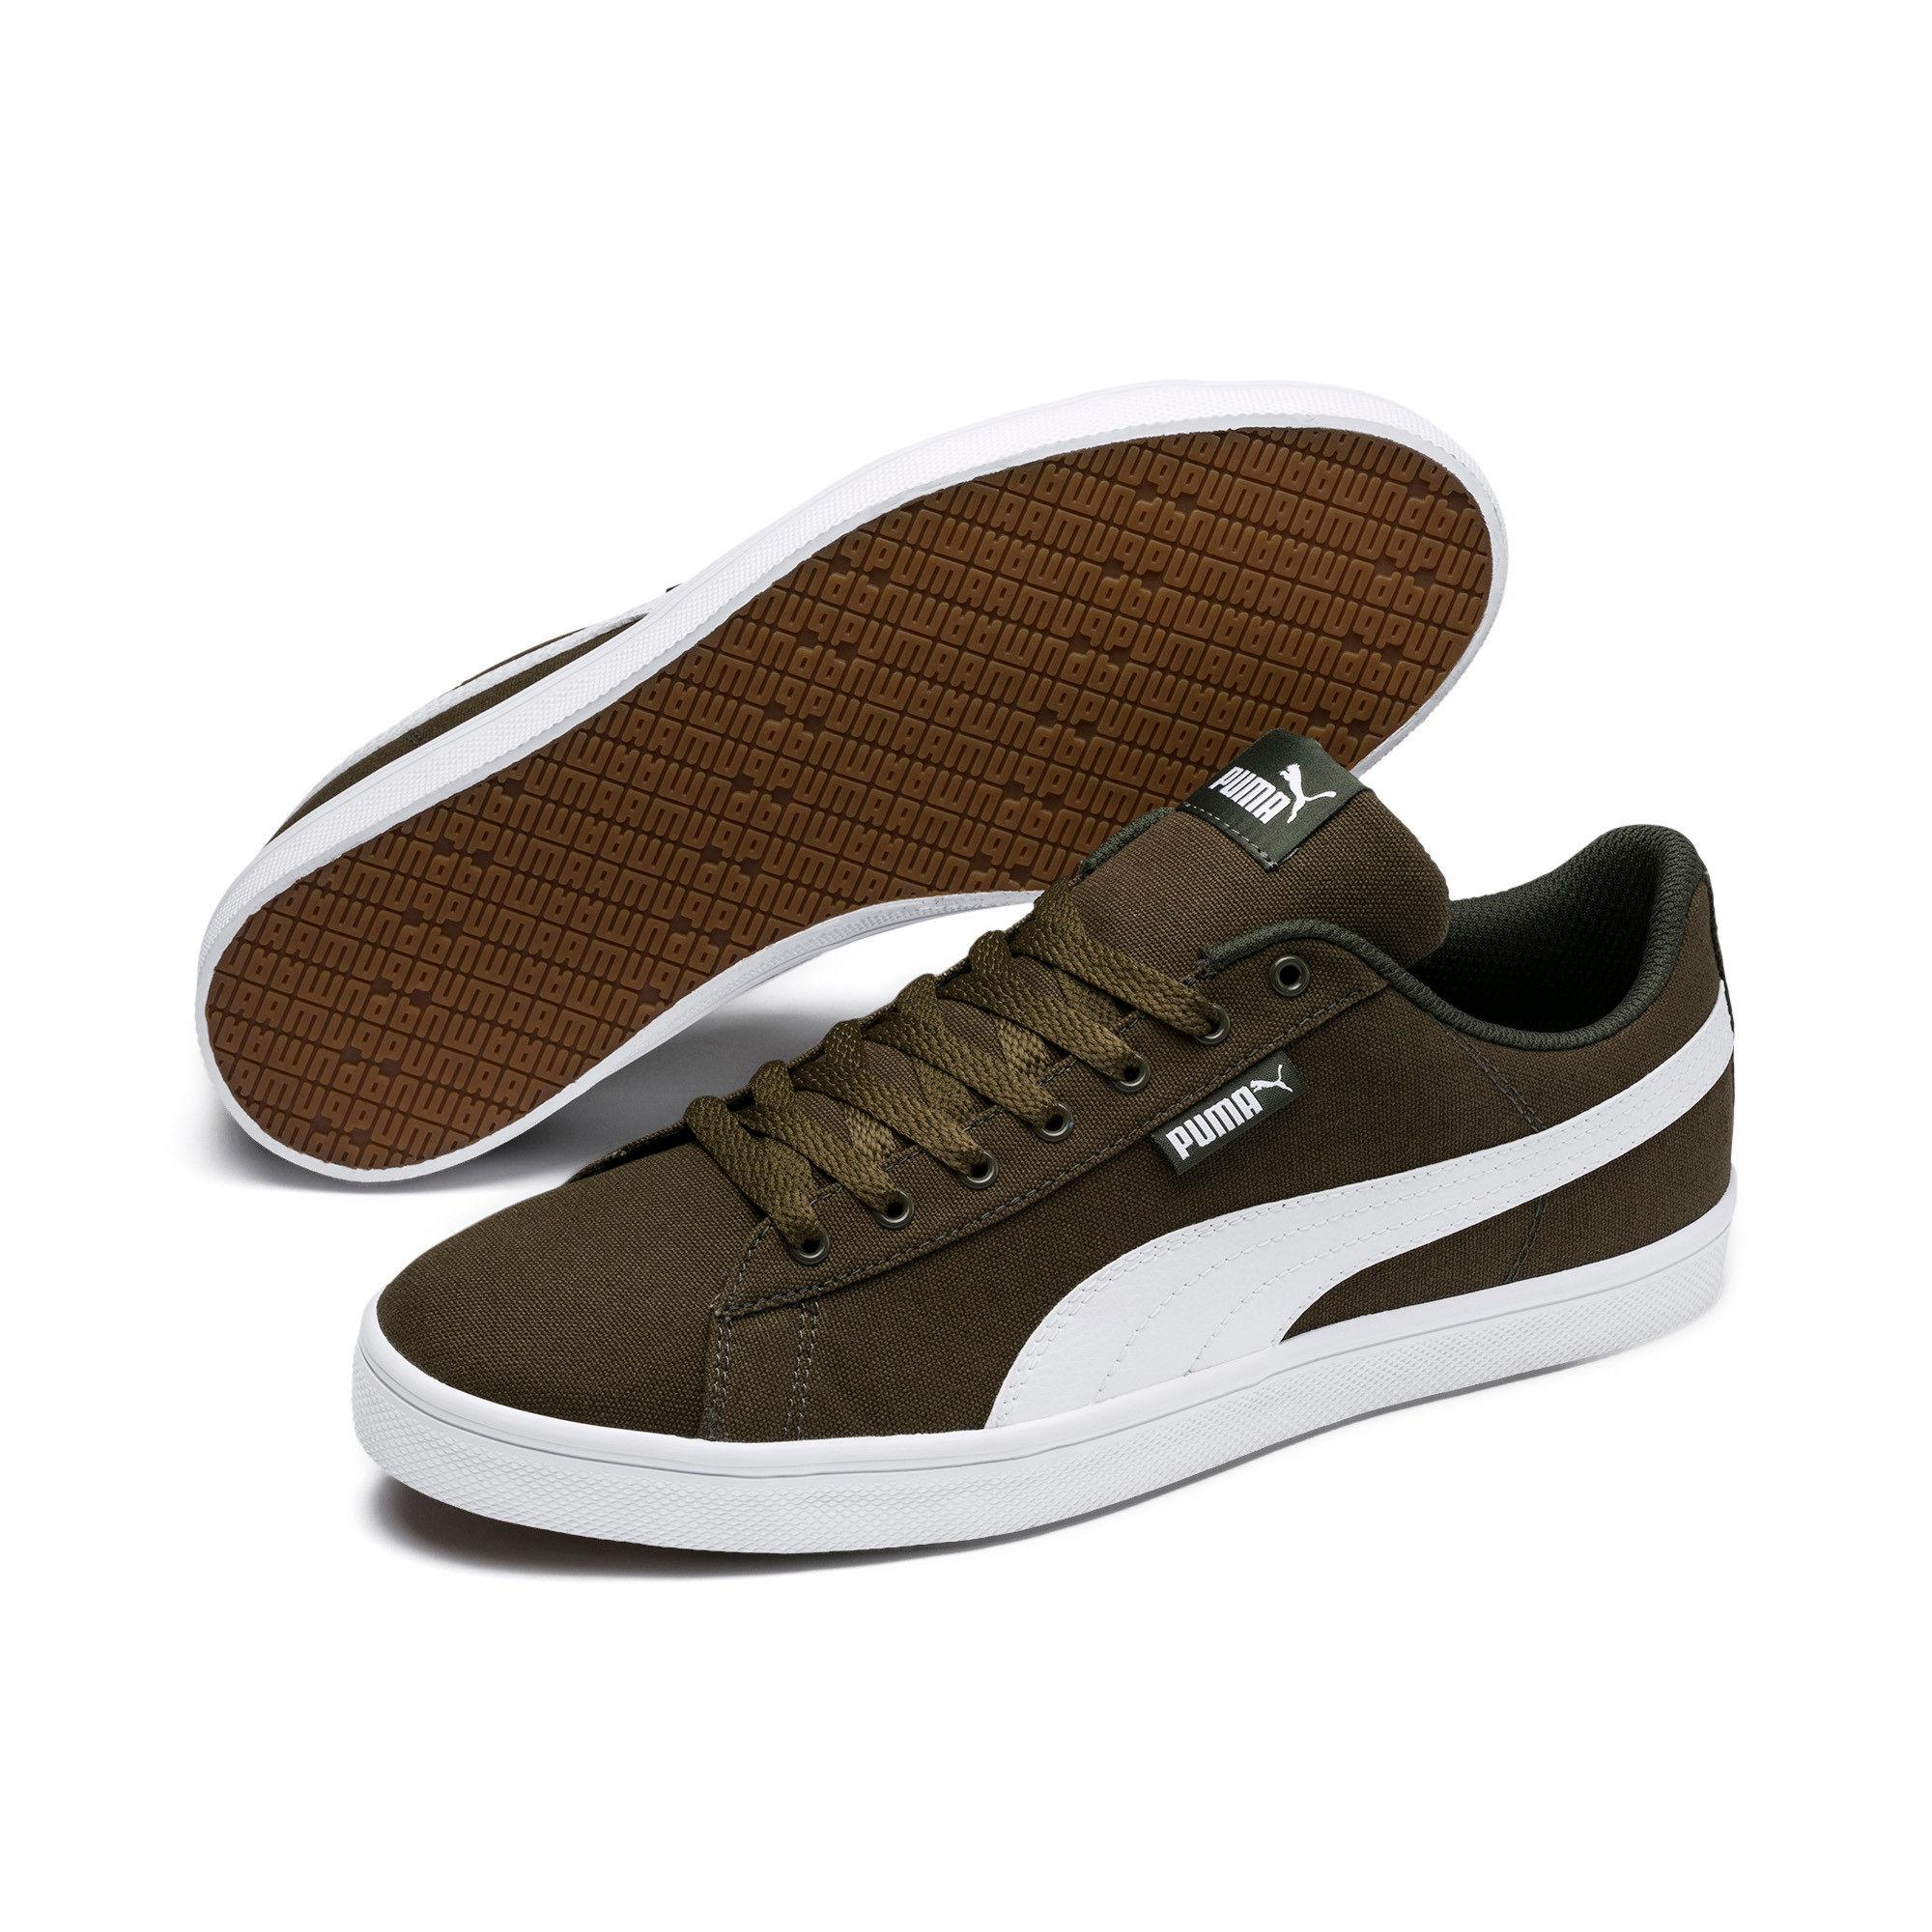 Puma Urban Plus Cv Sneaker: Buy Puma